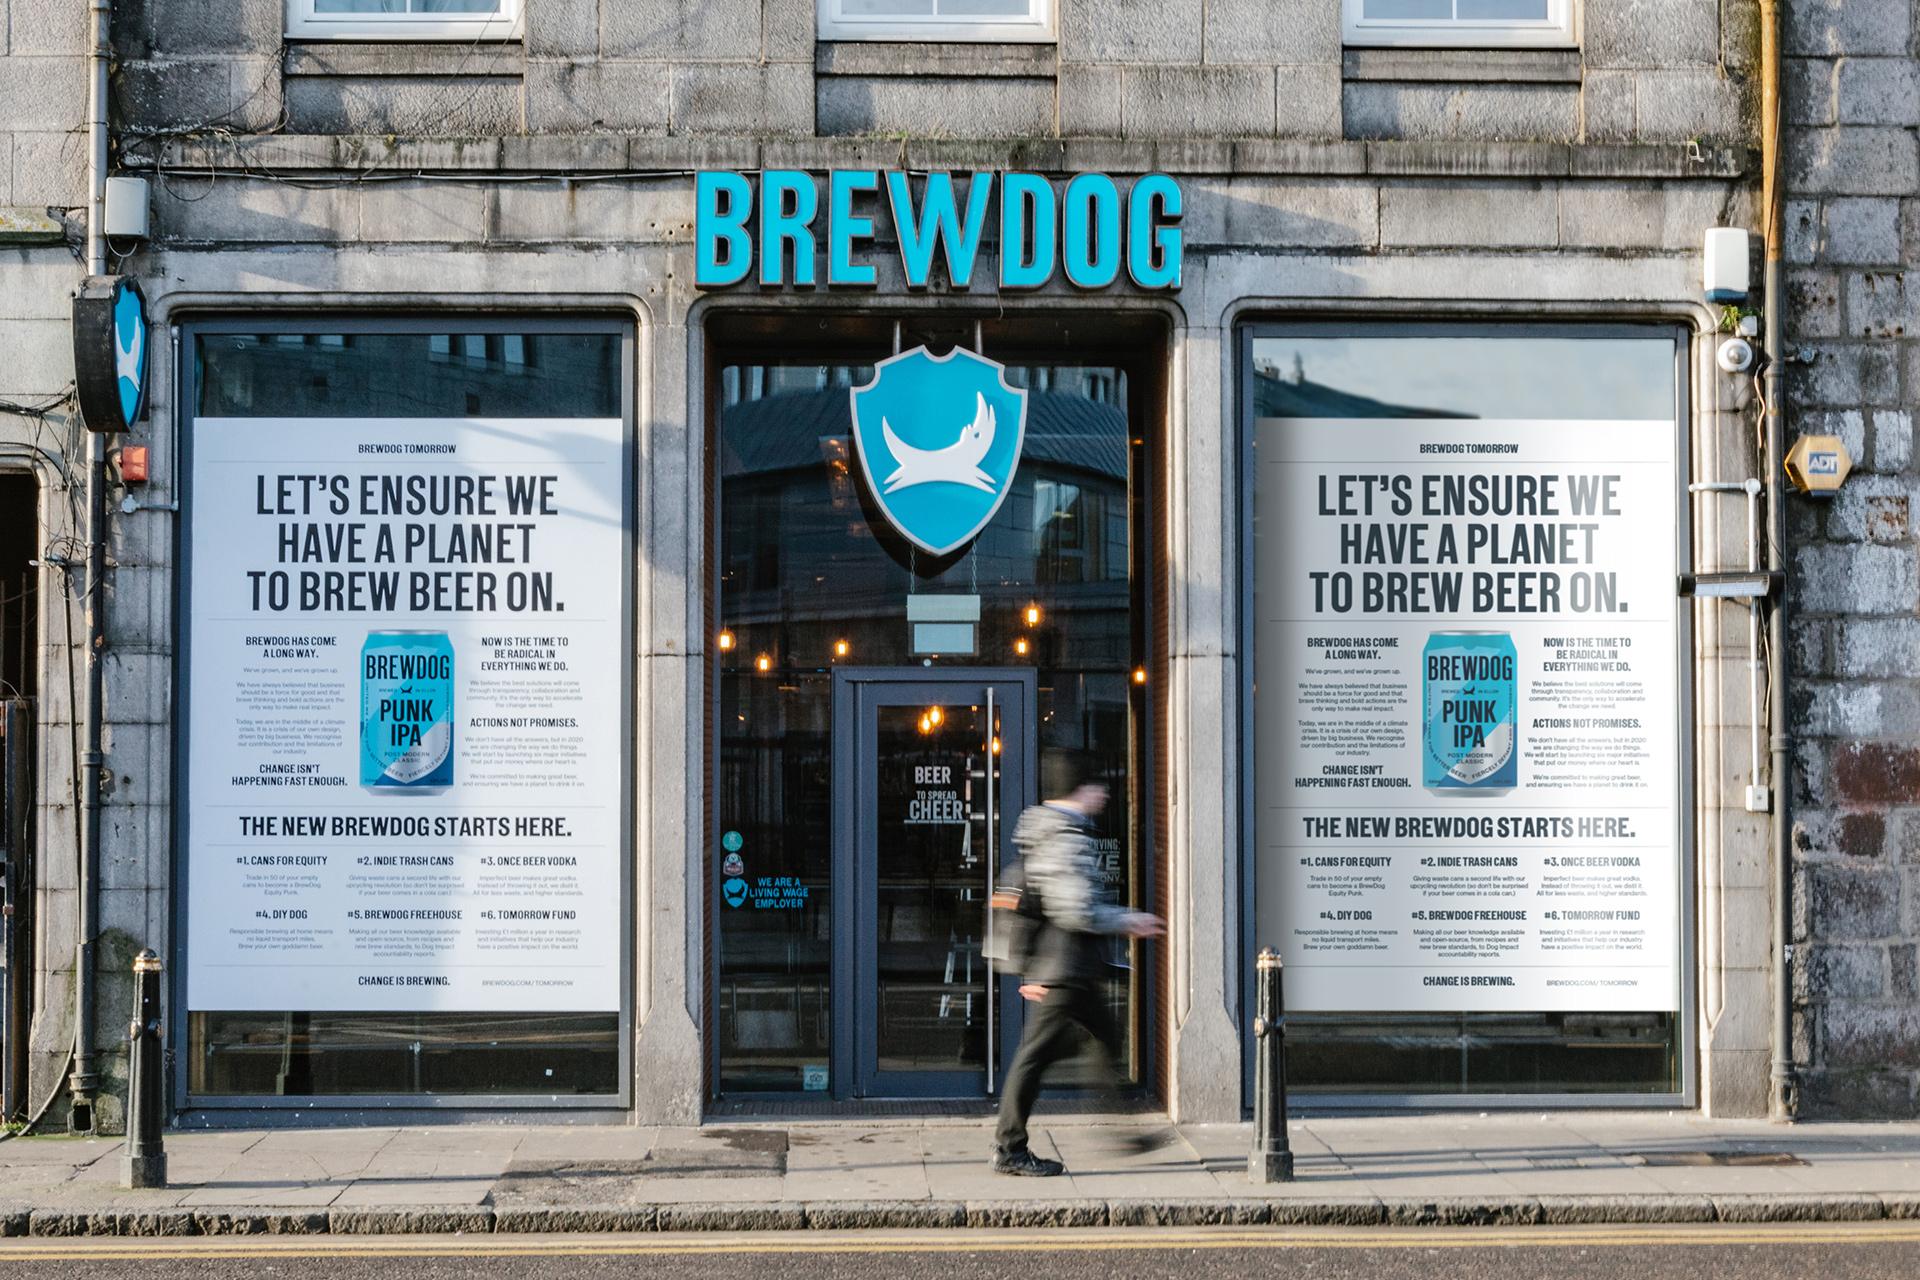 An image of the new BrewDog identity